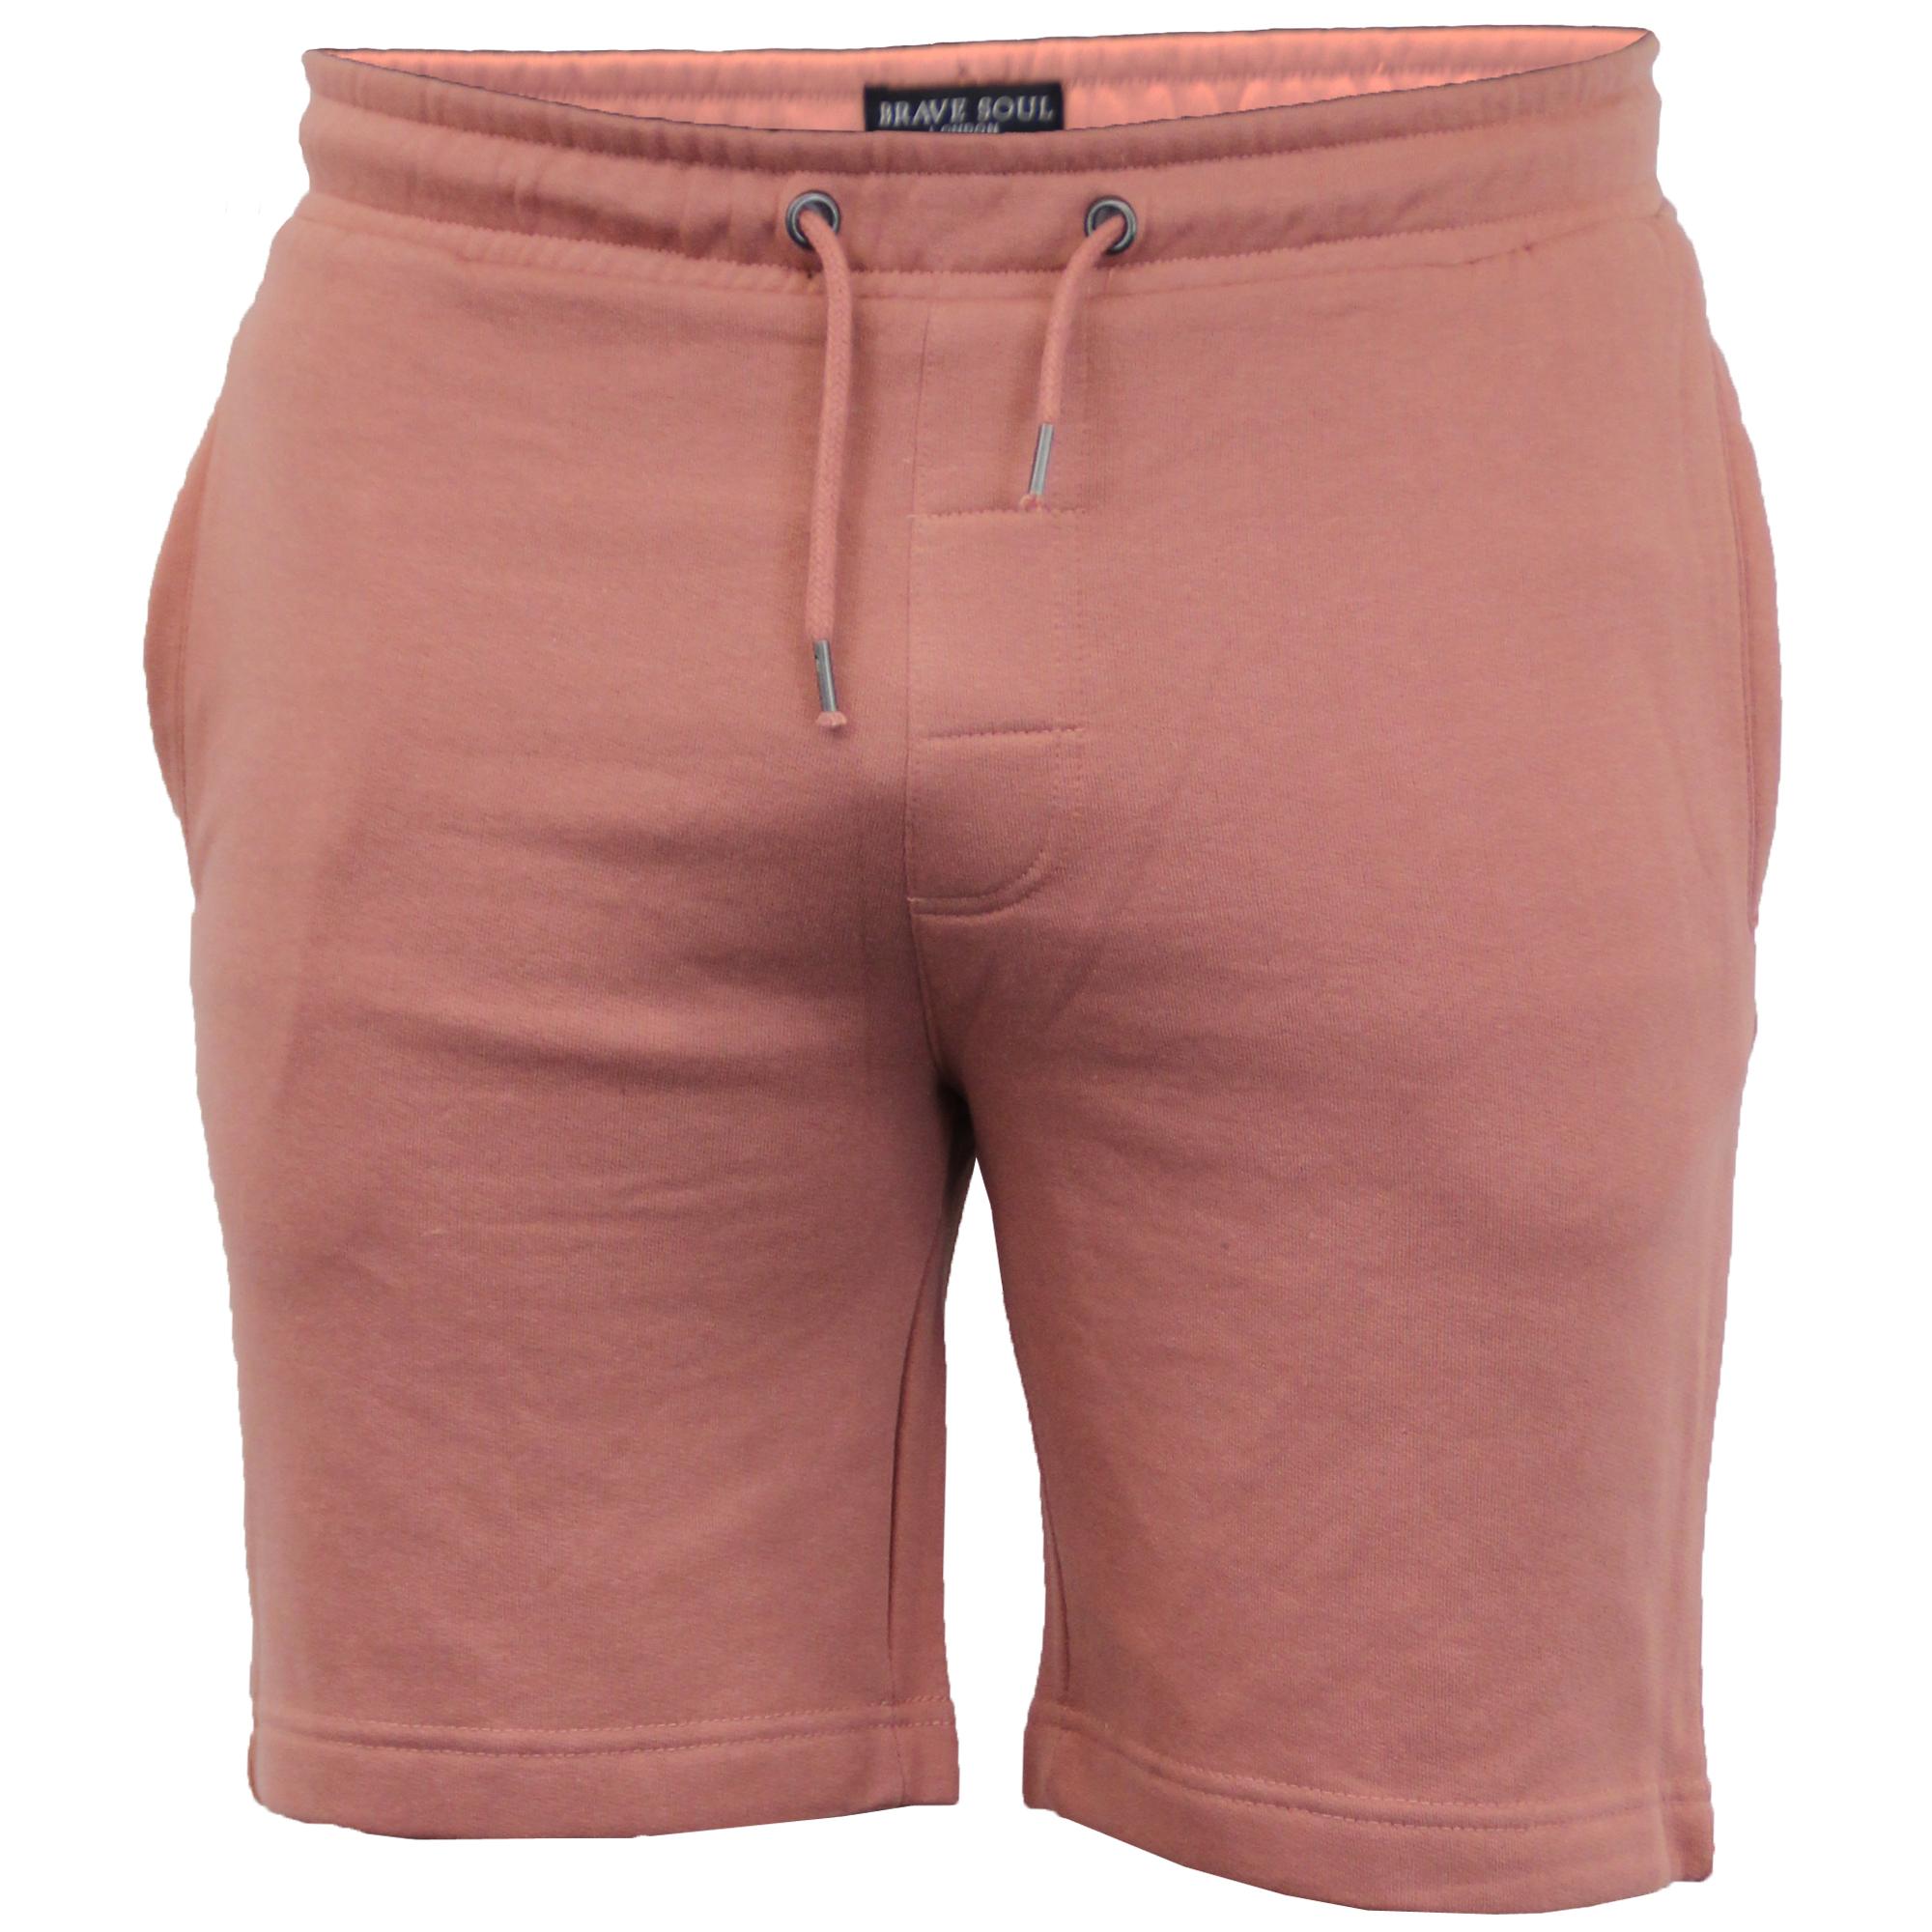 Mens-Jogger-Shorts-Tarley-by-Brave-Soul-Knee-Length-Casual-Fleece-Lined-Summer thumbnail 32